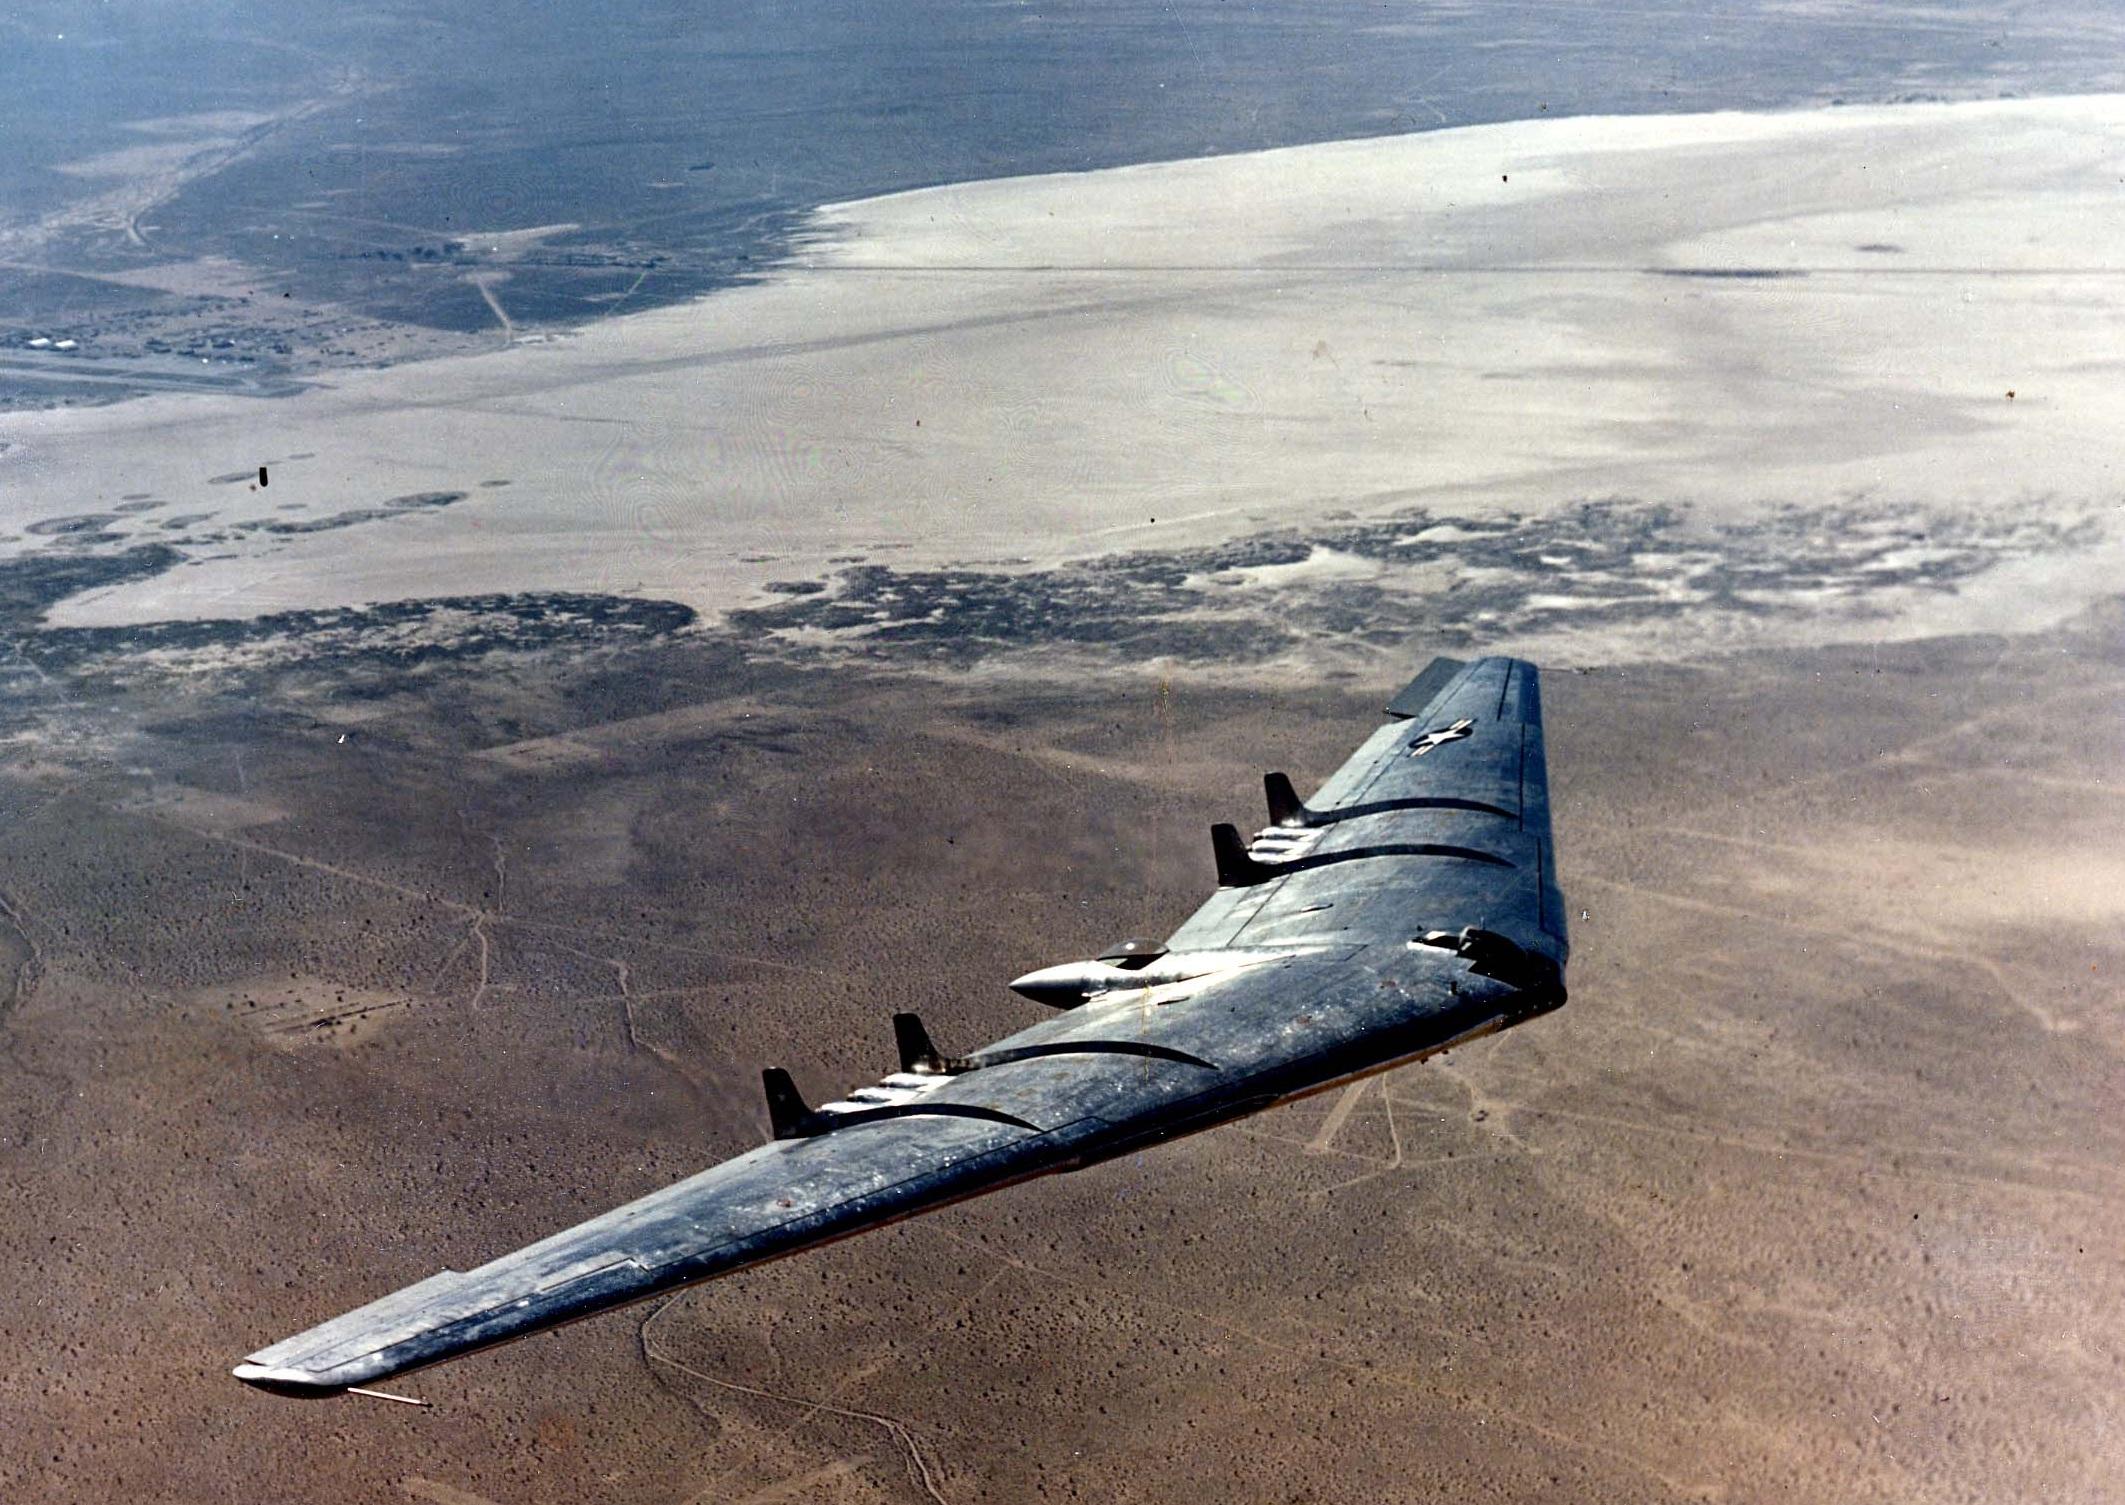 northrop-yb-49-over-muroc-afb1.jpg